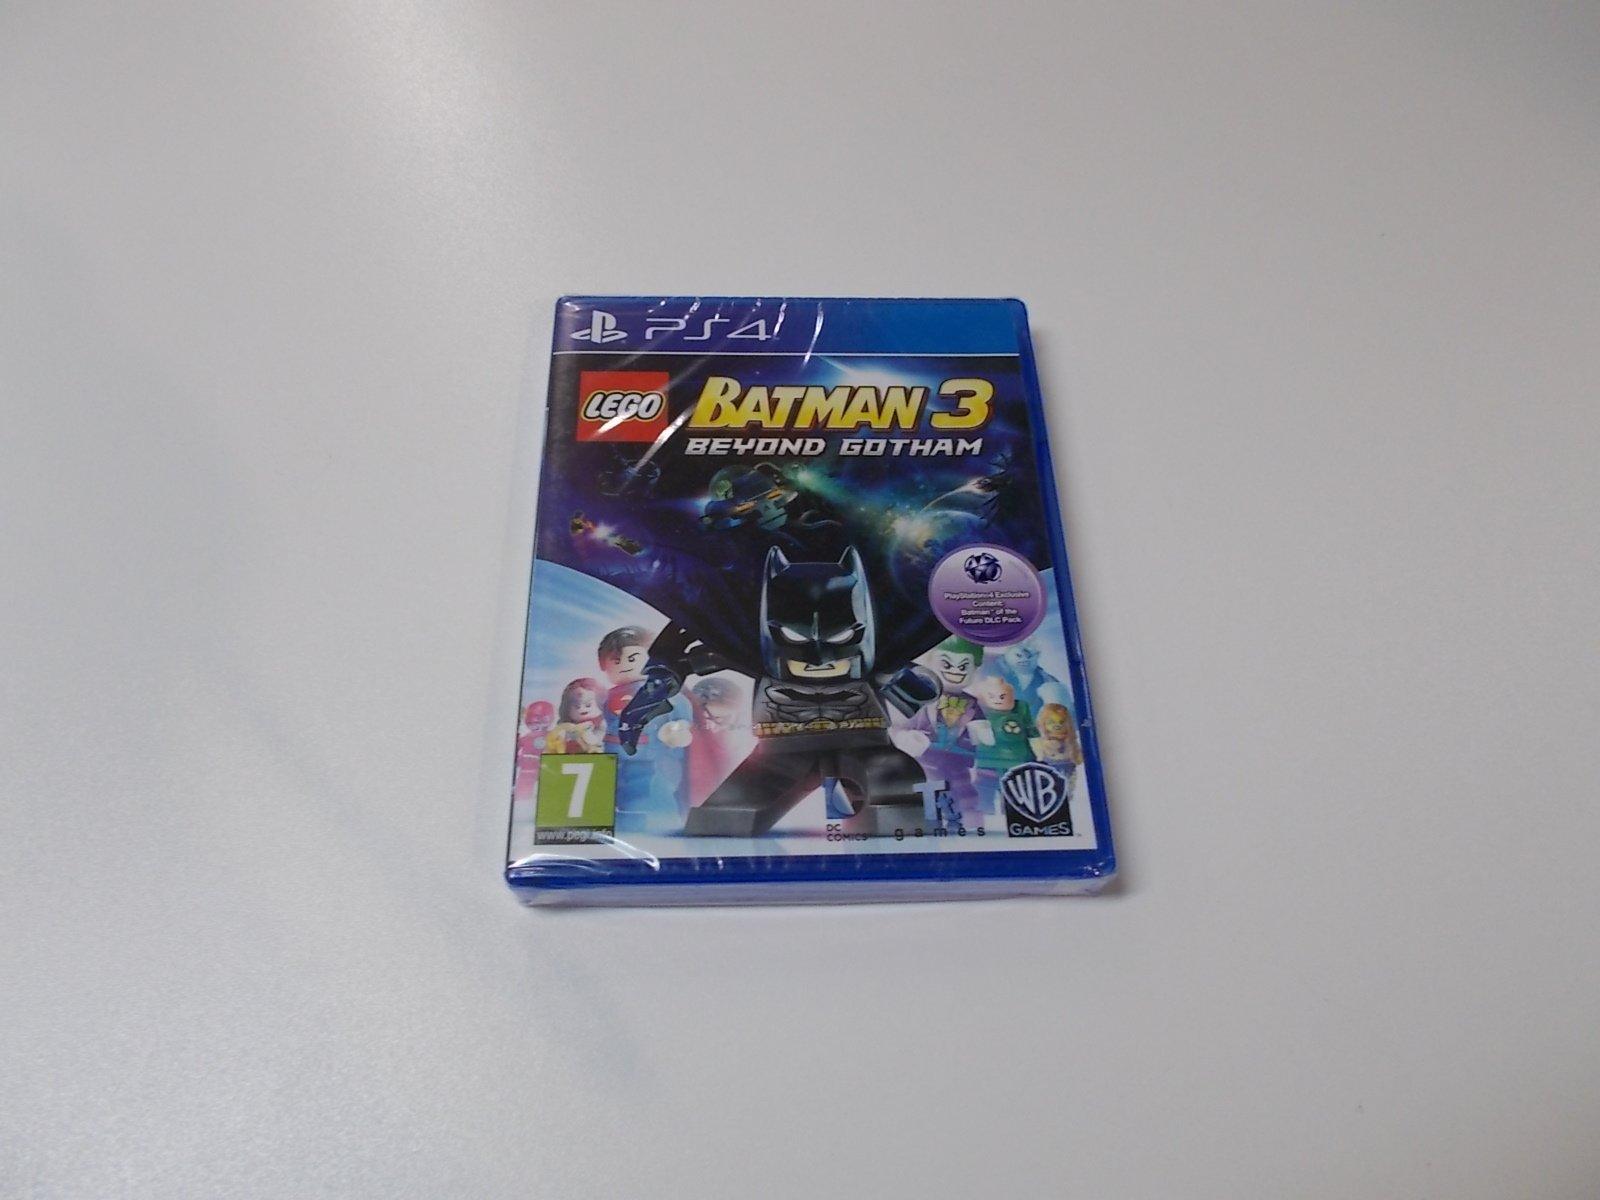 Lego Batman 3 beyond gotham - GRA Ps4 - Opole 0480